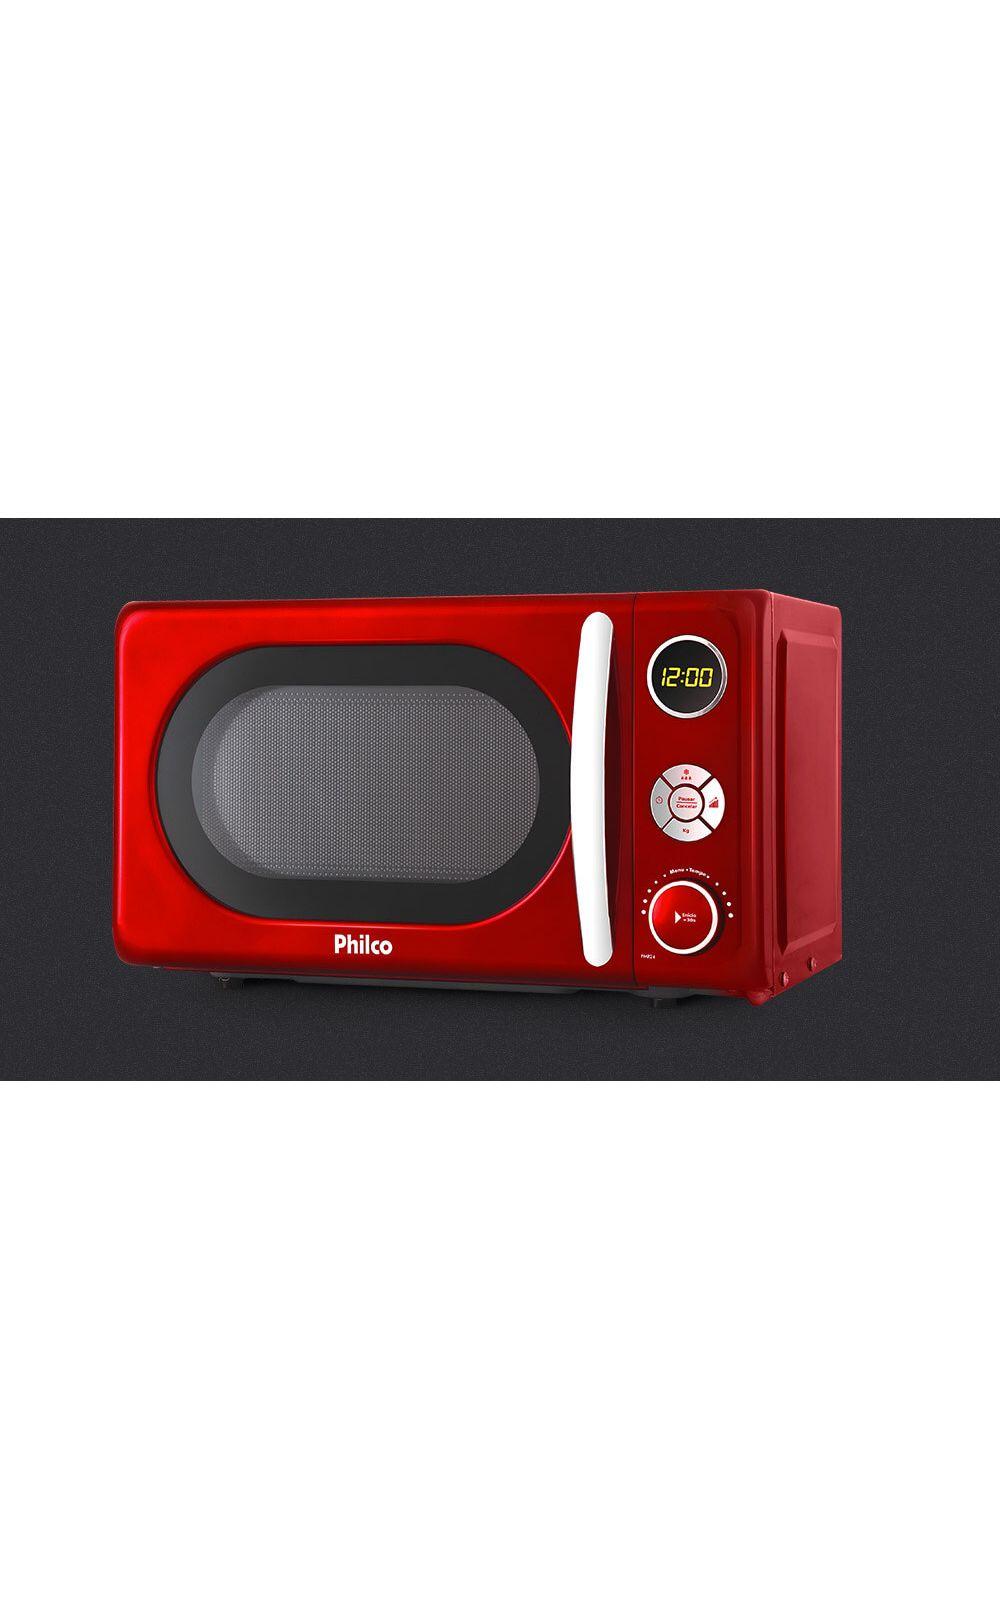 0bec1dd06 Foto 3 - Micro-ondas Retrô Philco Premium